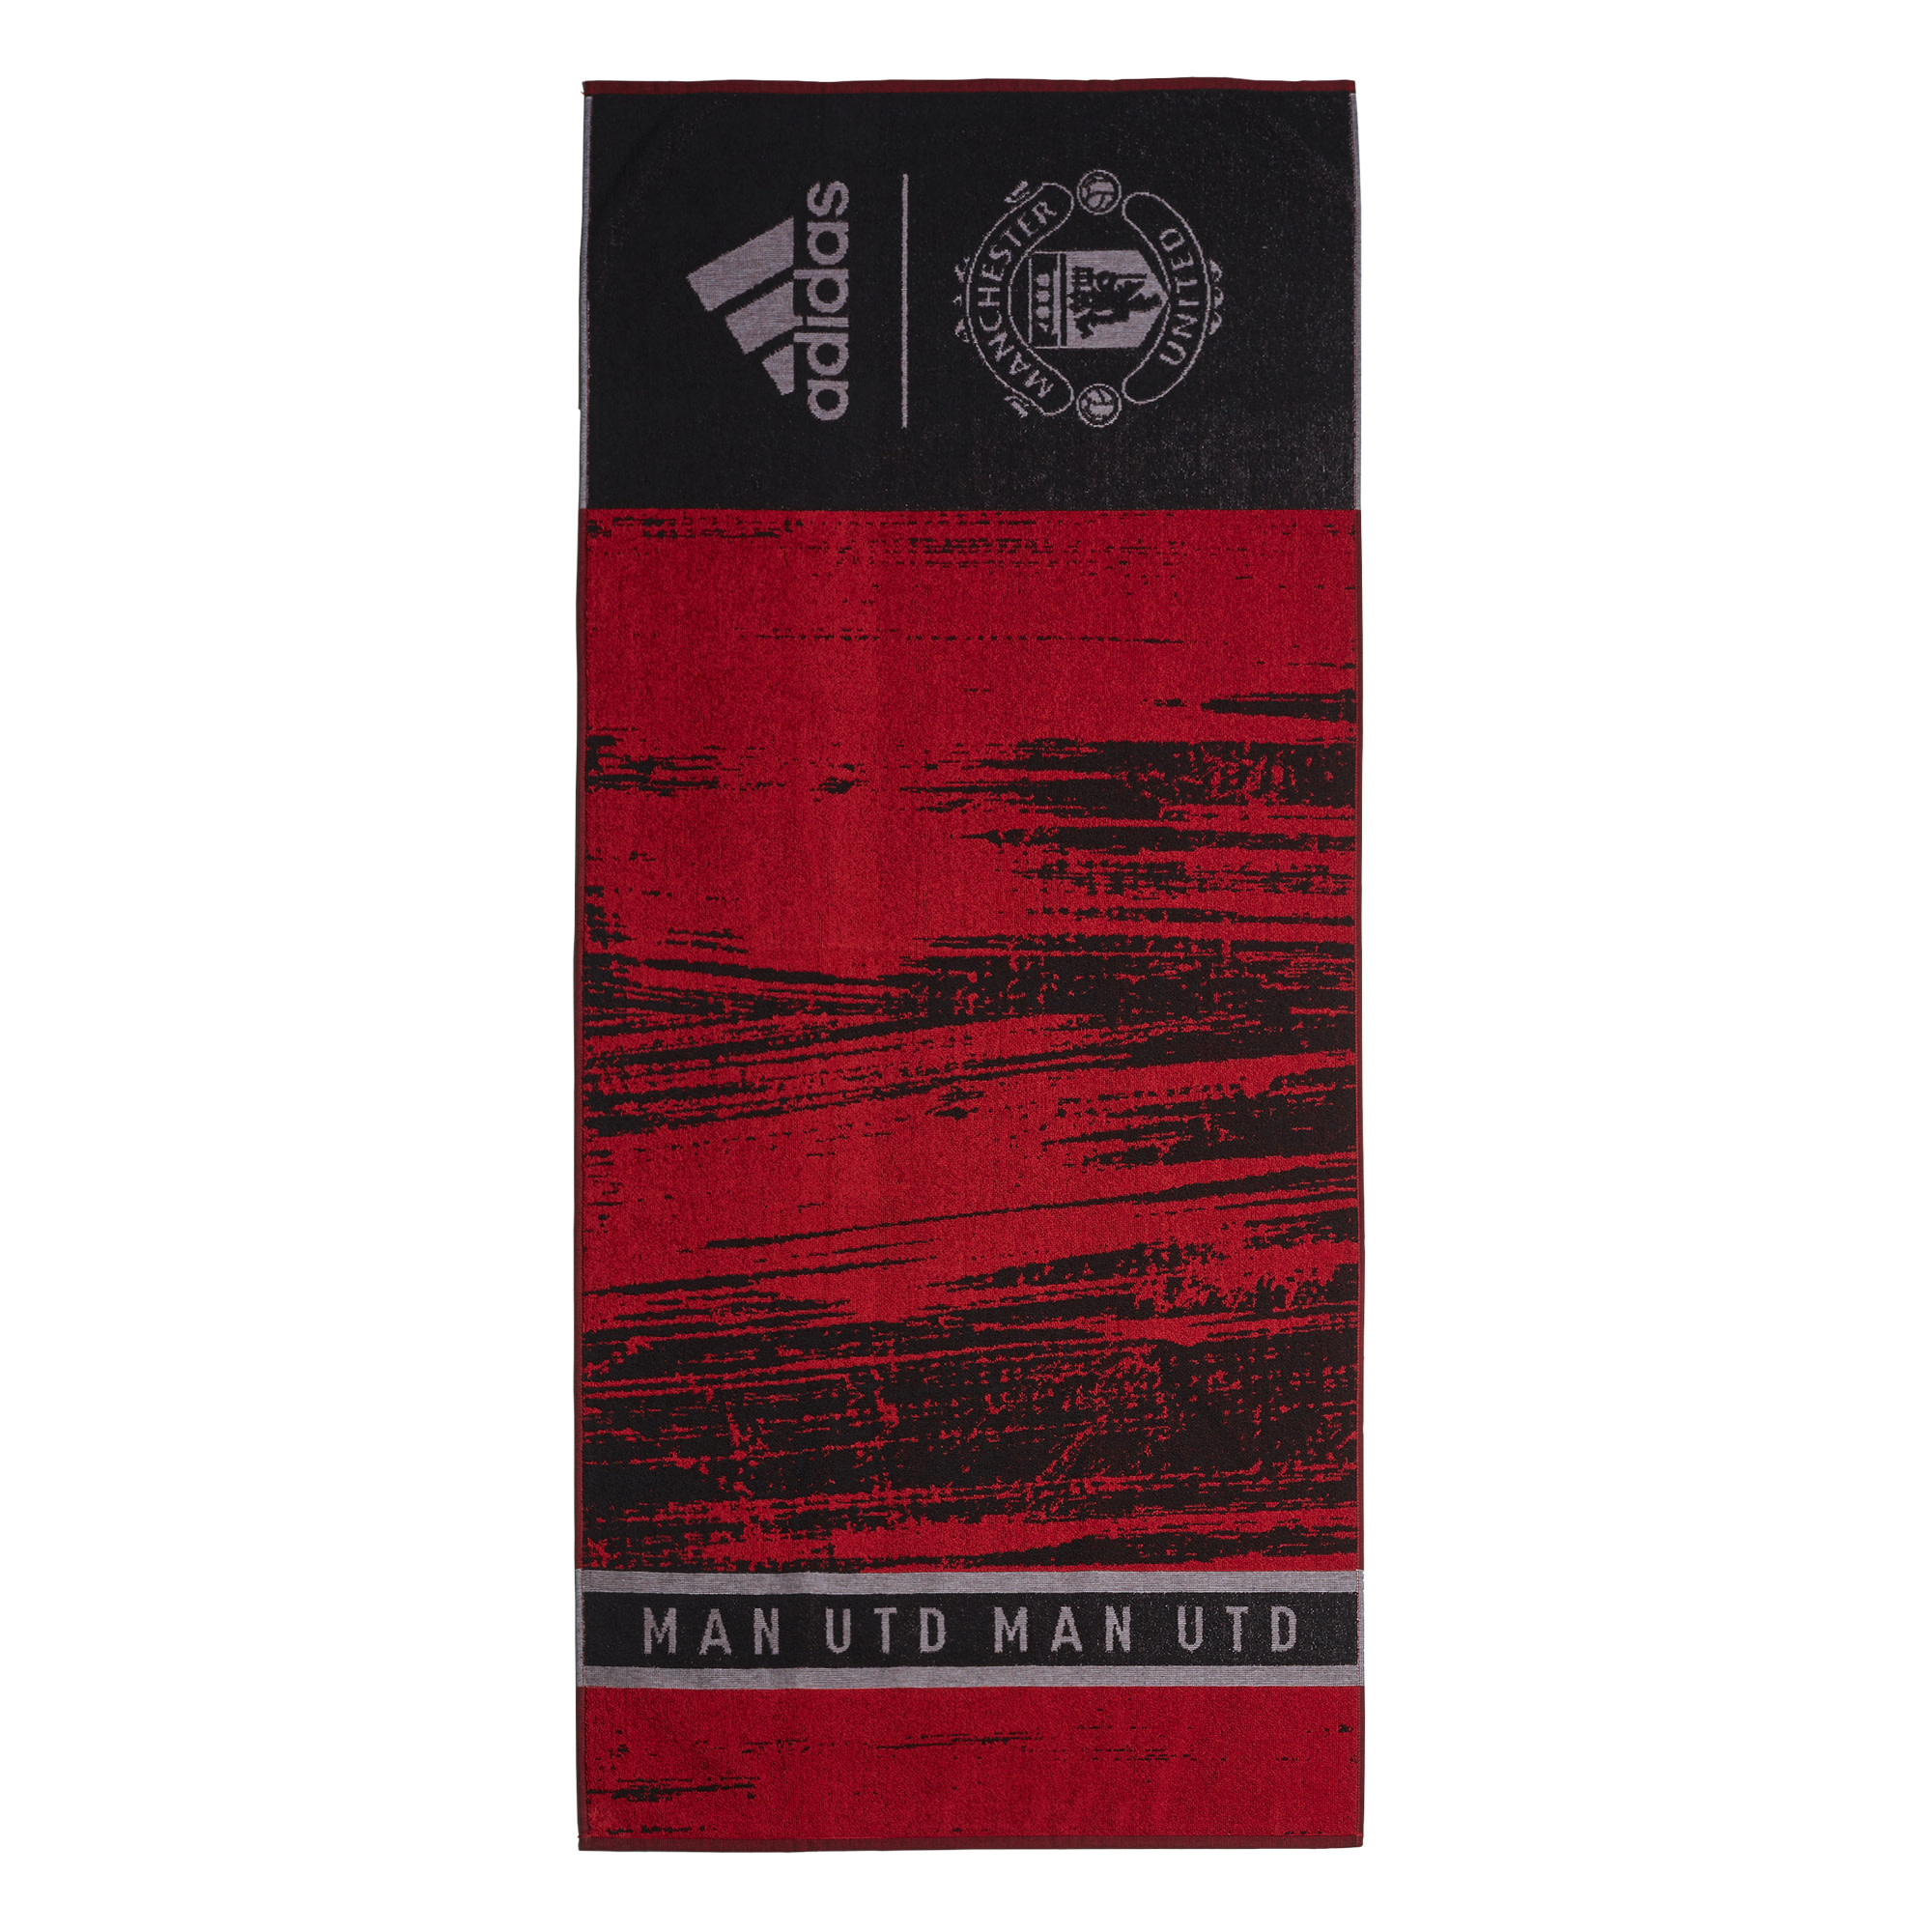 Adidas ADIDAS Manchester United Towel